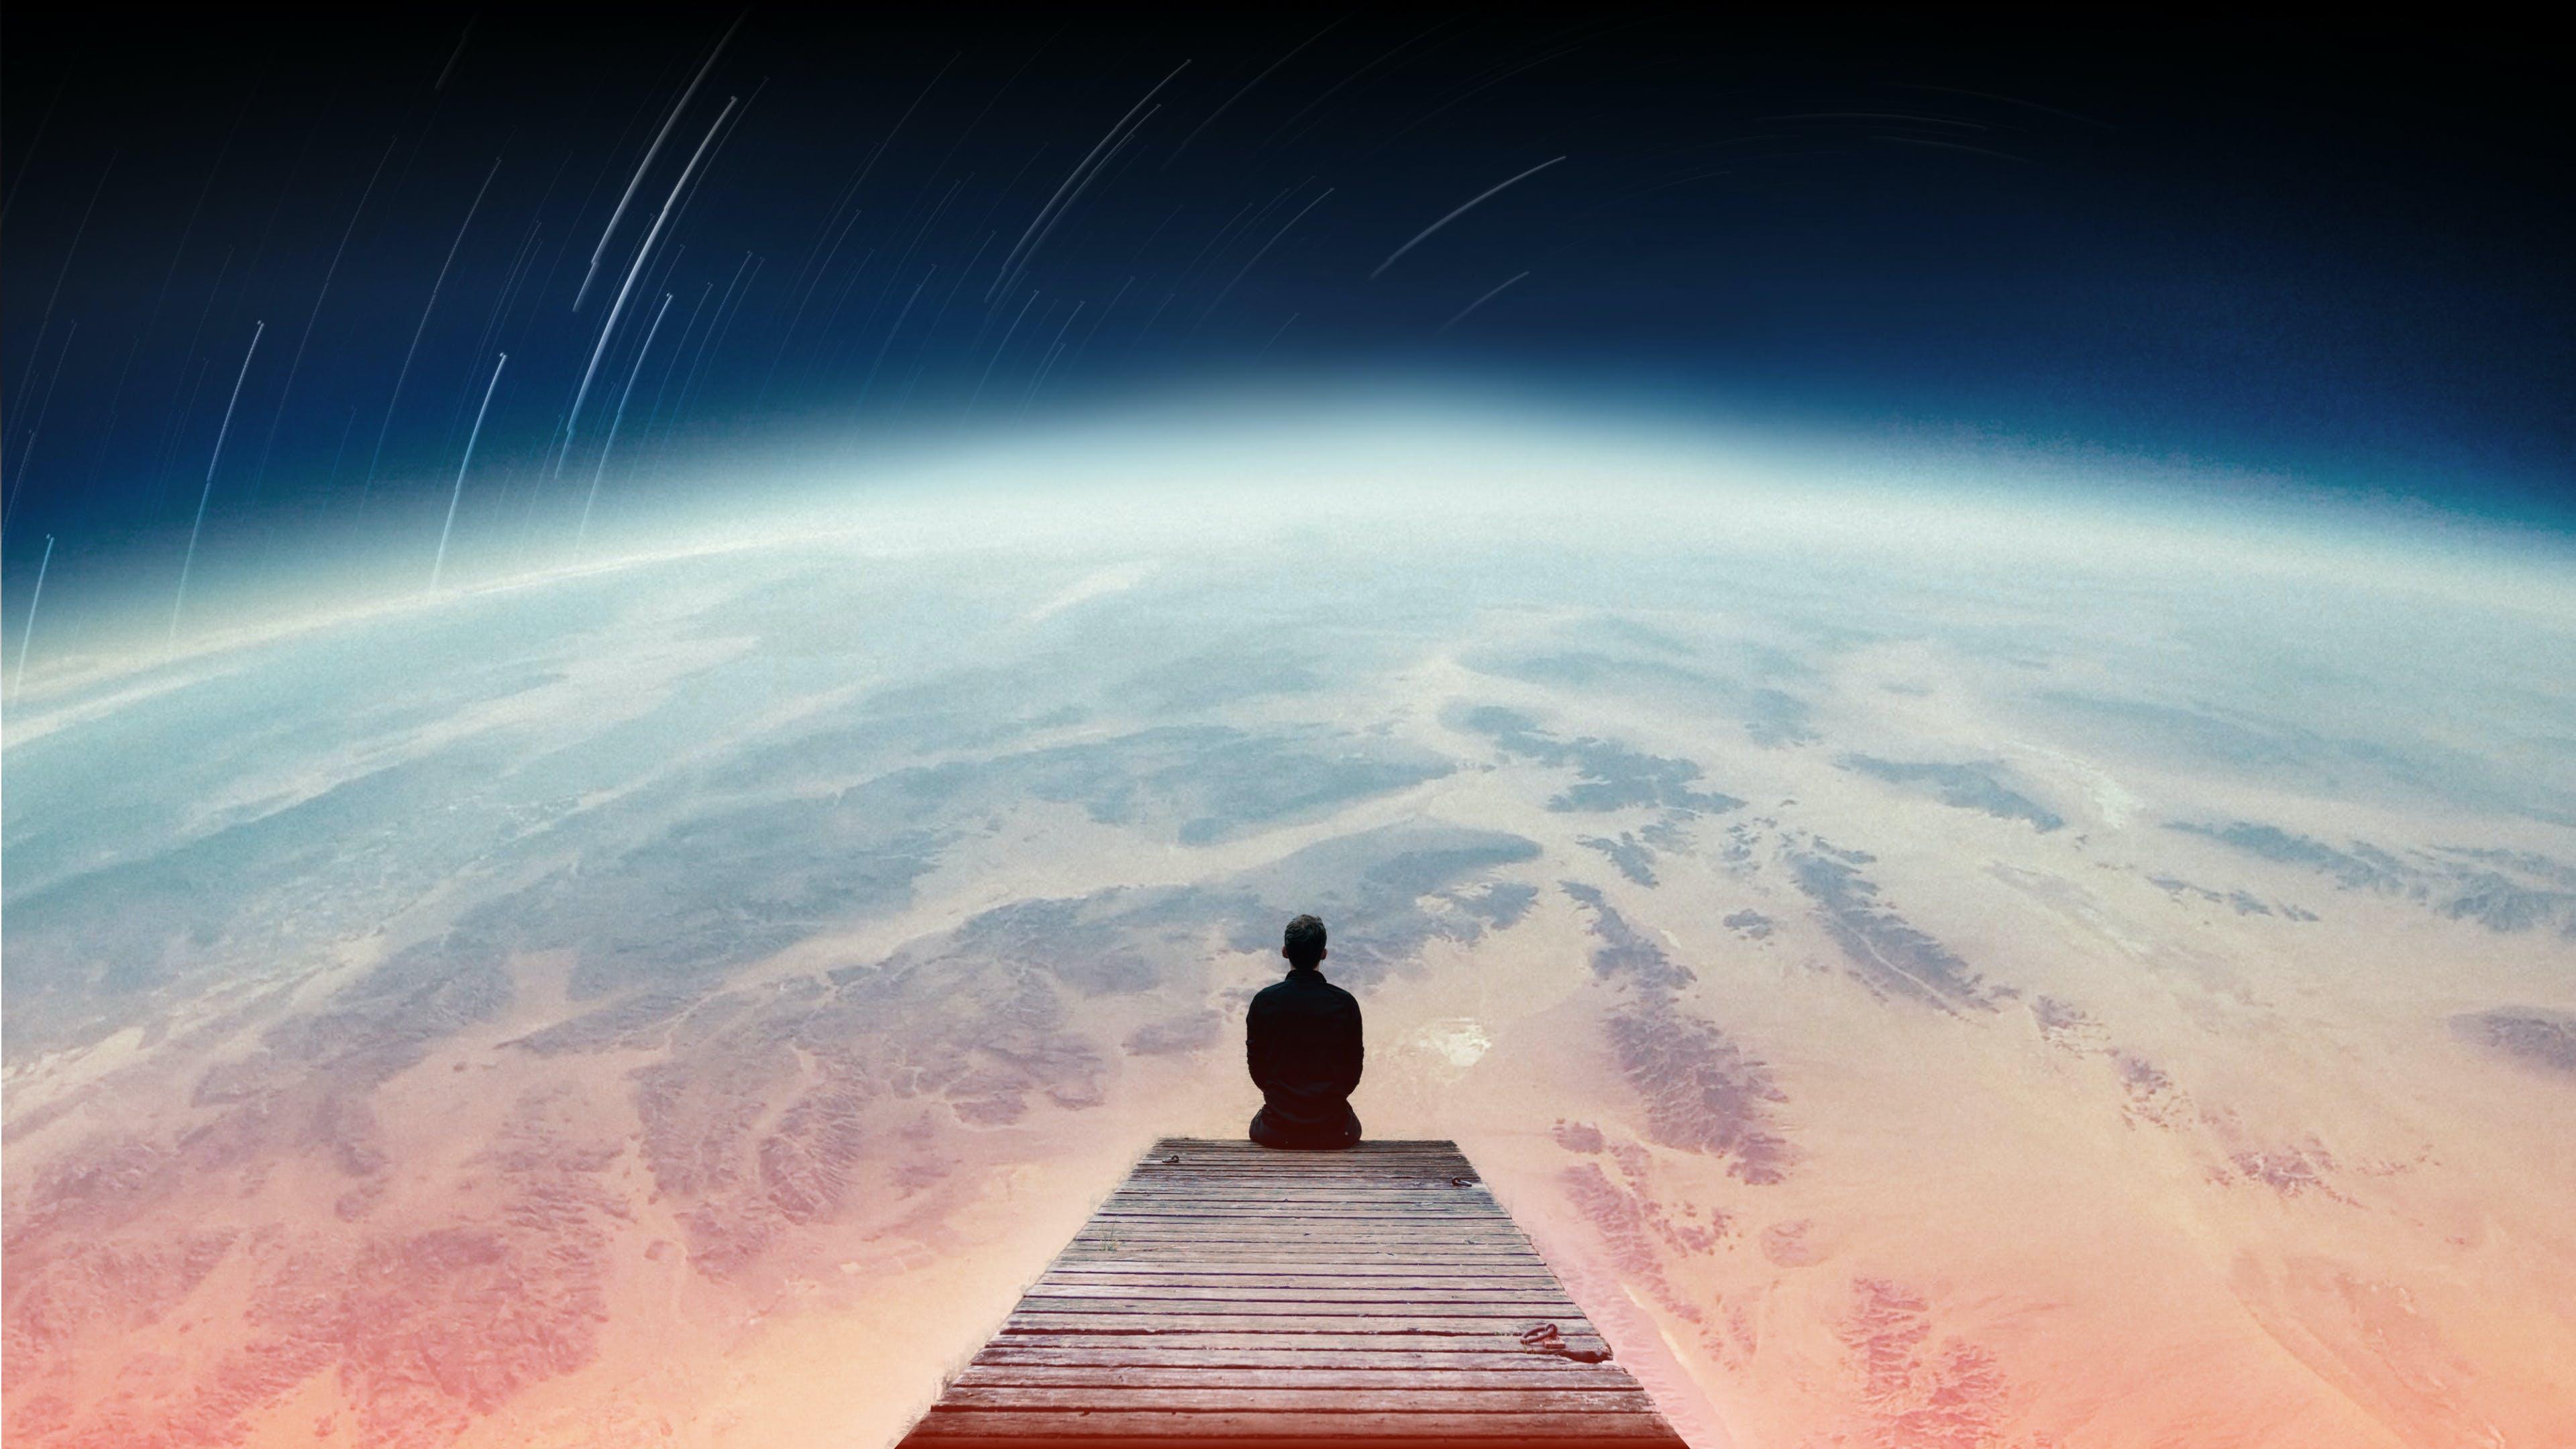 Free stock photo of fantasy, man sitting on a pier, night, planet